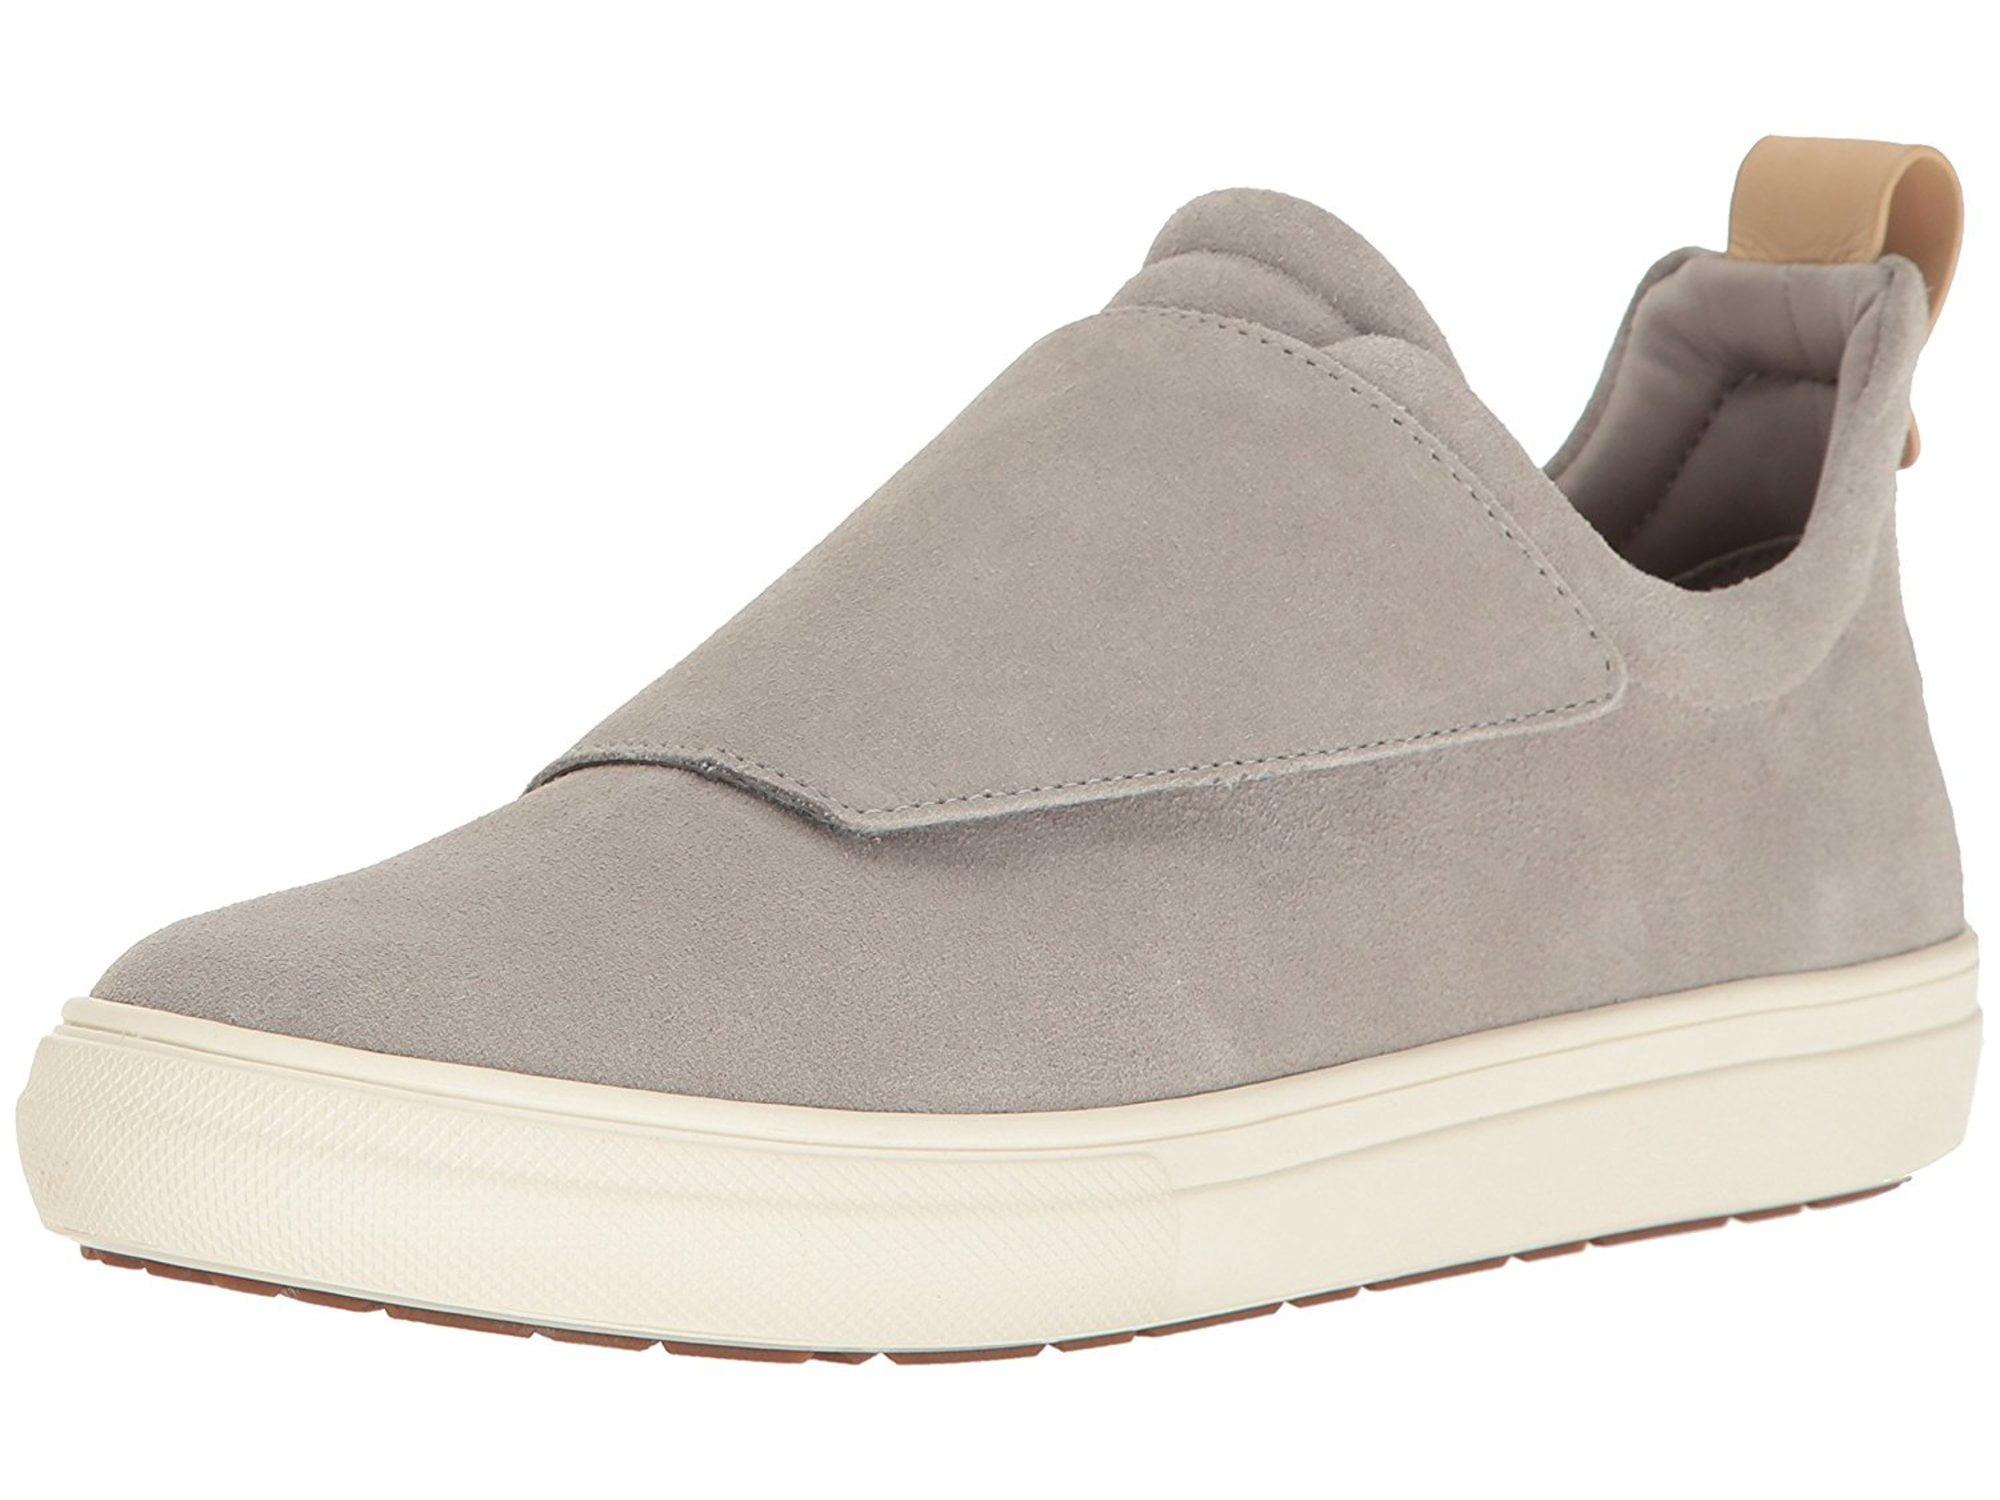 3e76fb65314c55 Aldo Mens Forsivo Leather Low Top Fashion Sneakers